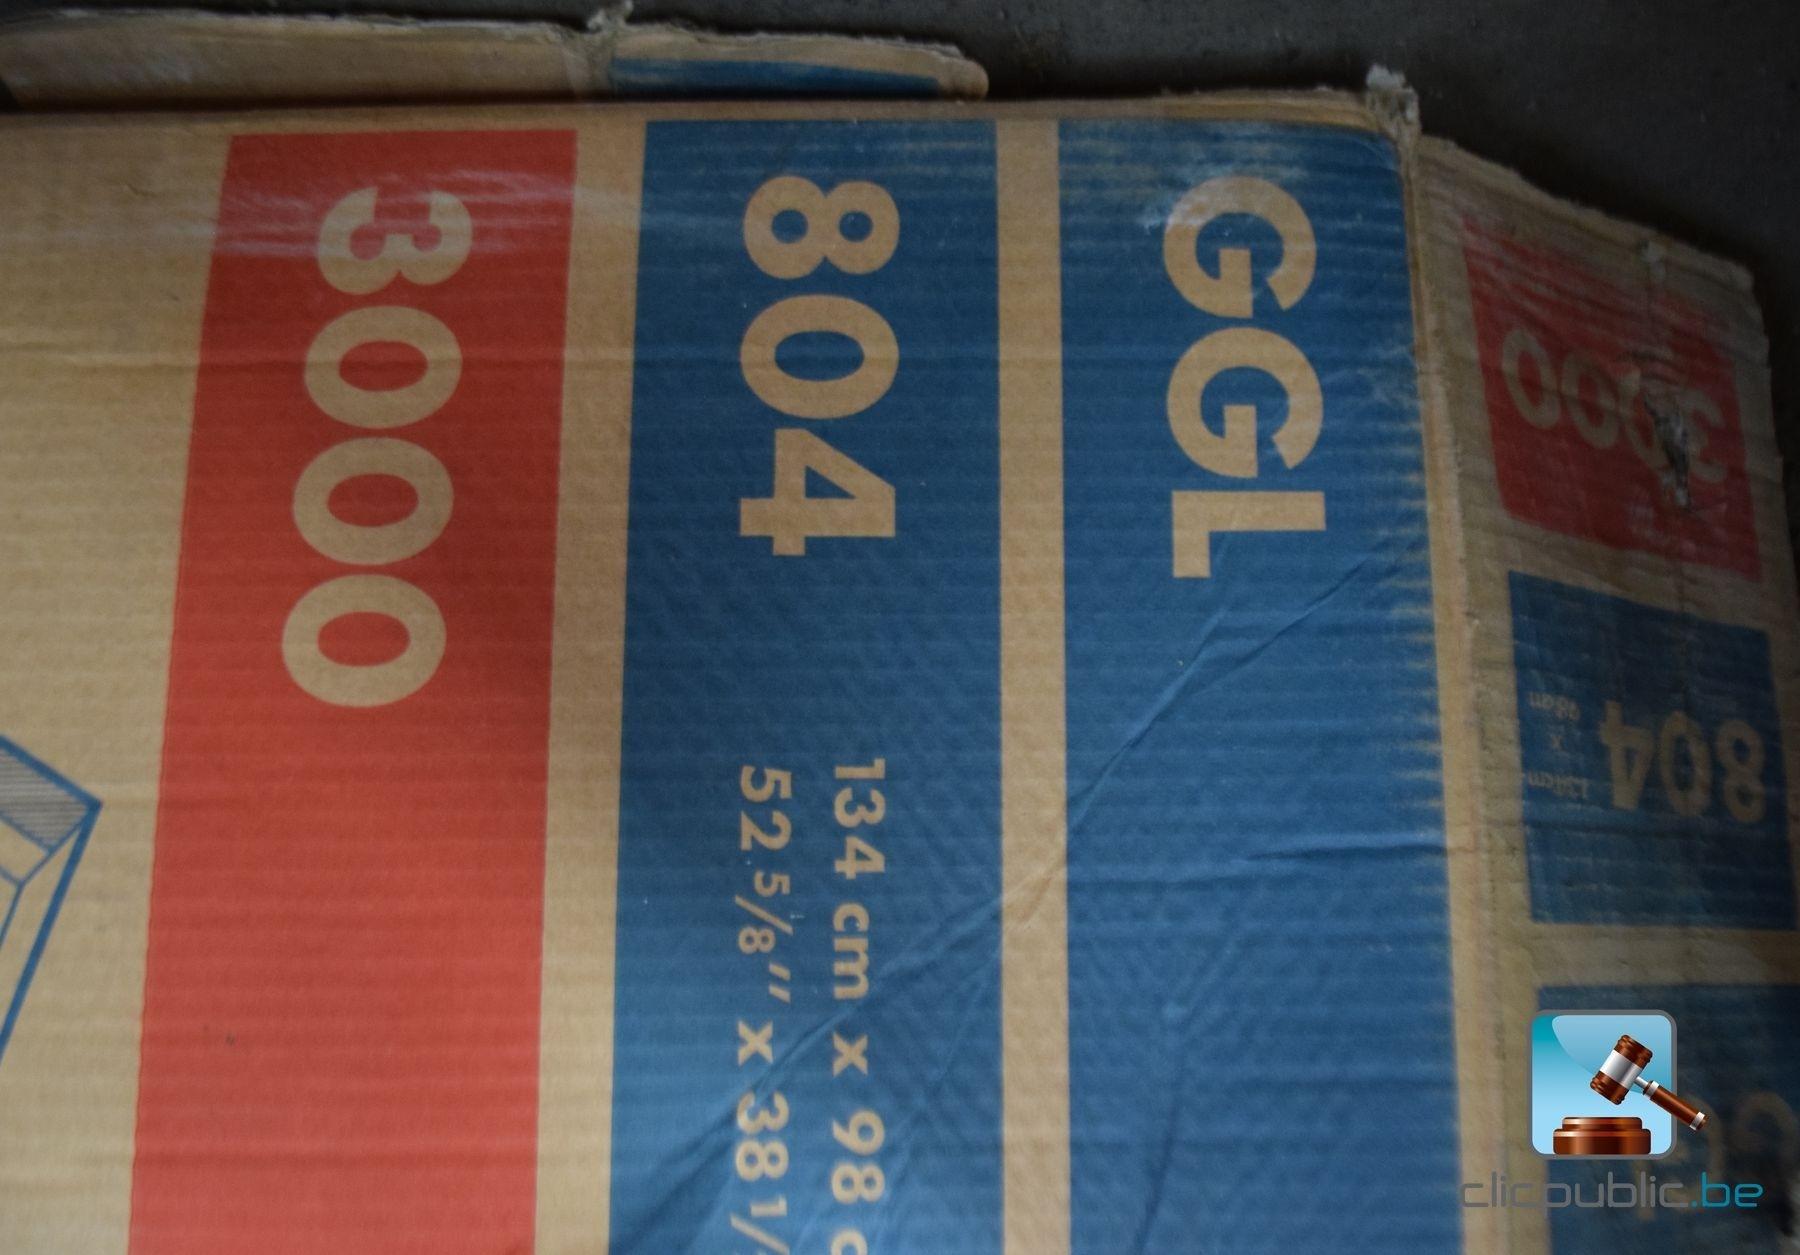 store velux ggl 804 edh 804 ref 67